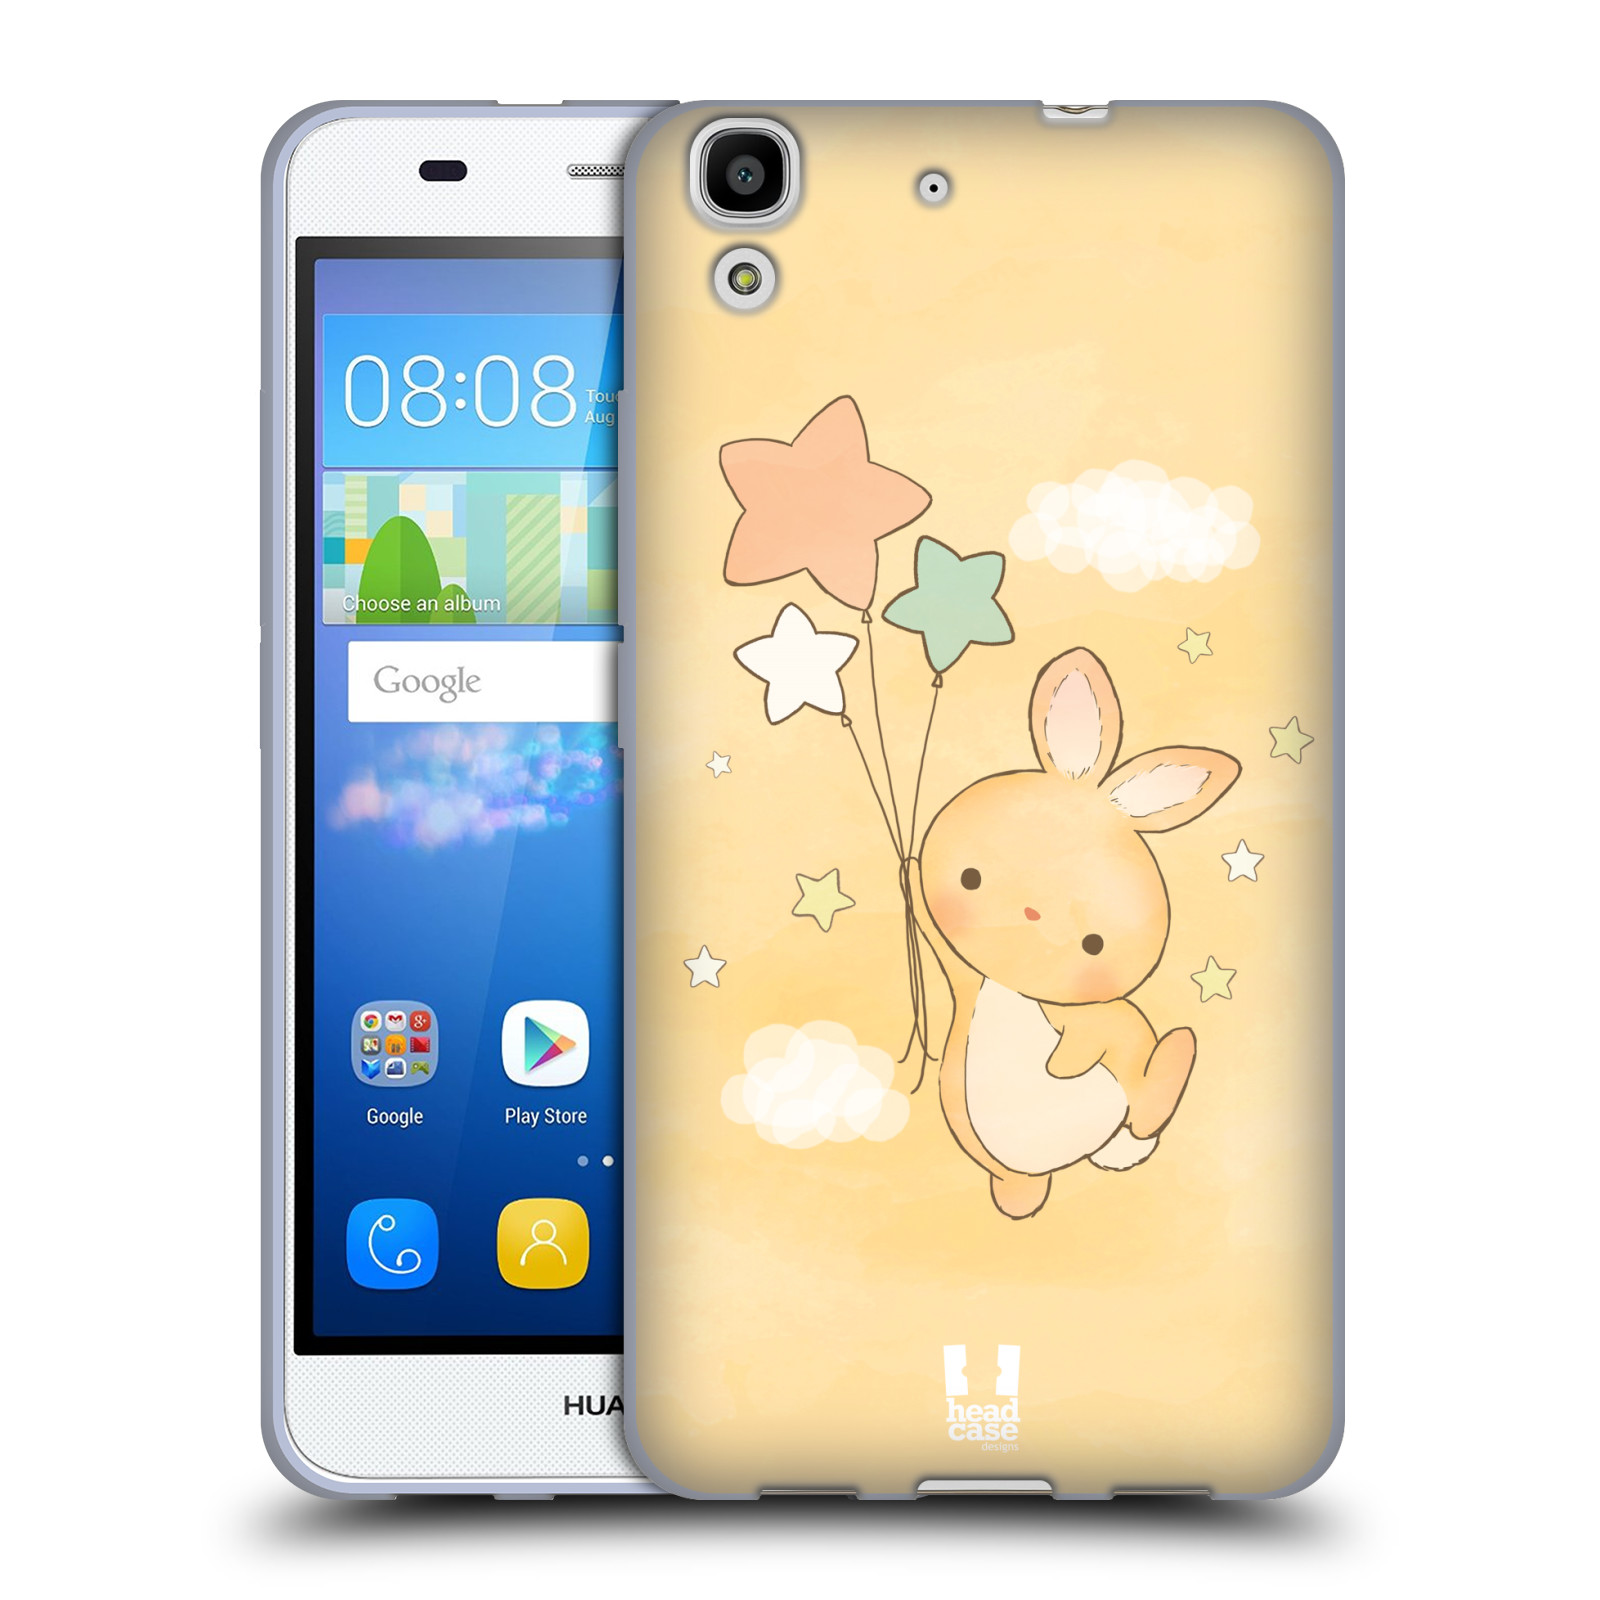 HEAD CASE silikonový obal na mobil HUAWEI Y6 vzor králíček a hvězdy žlutá